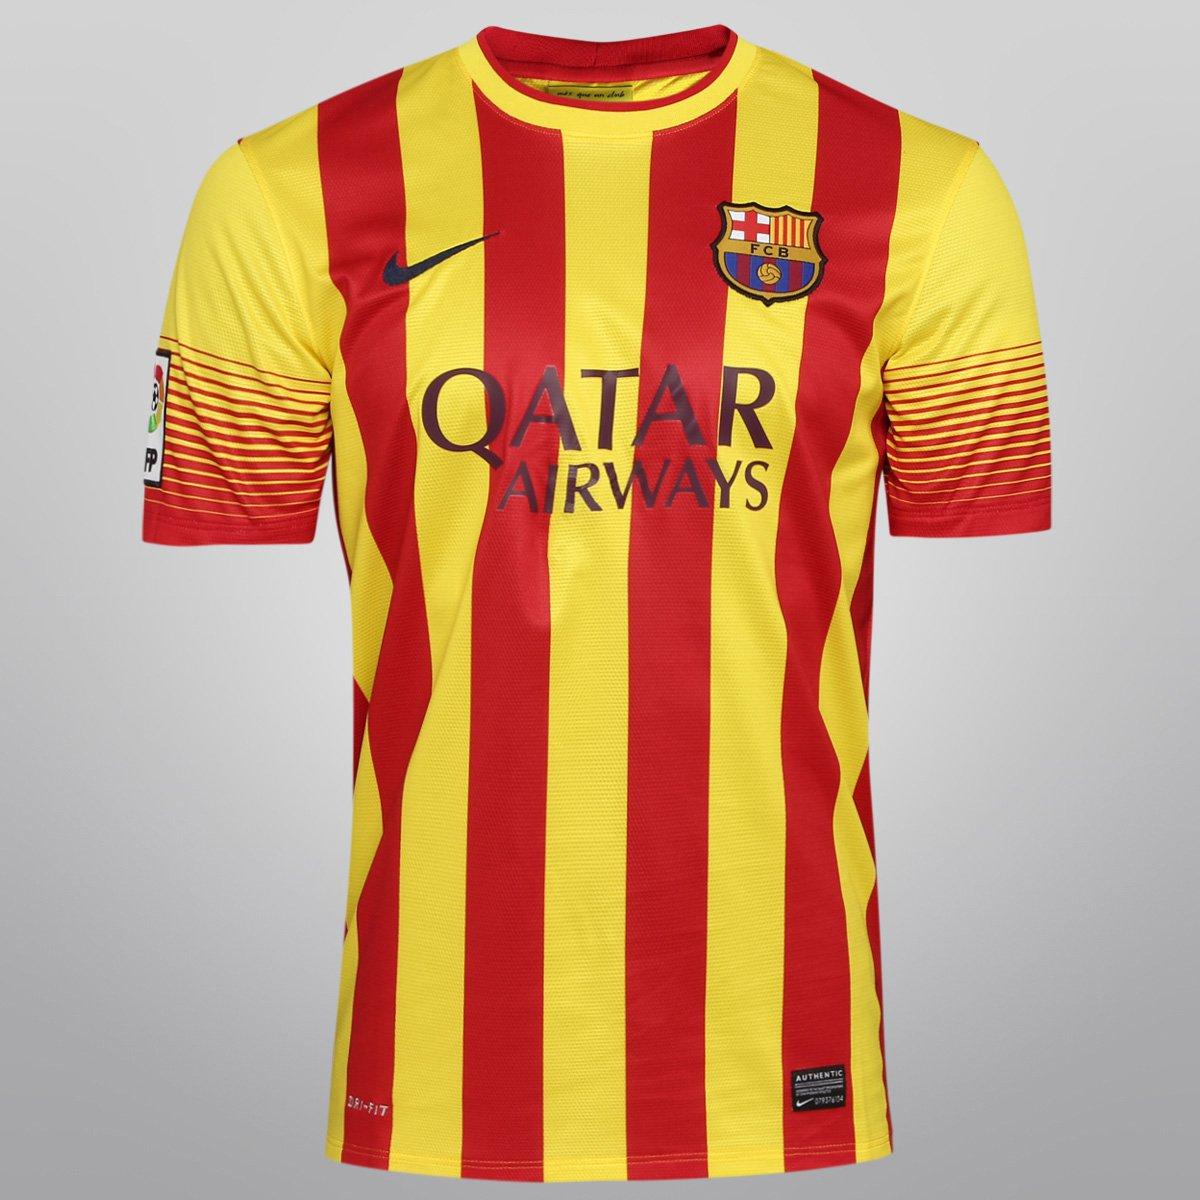 4a960129c3 Camisa Nike Barcelona Away 13 14 s nº - Compre Agora